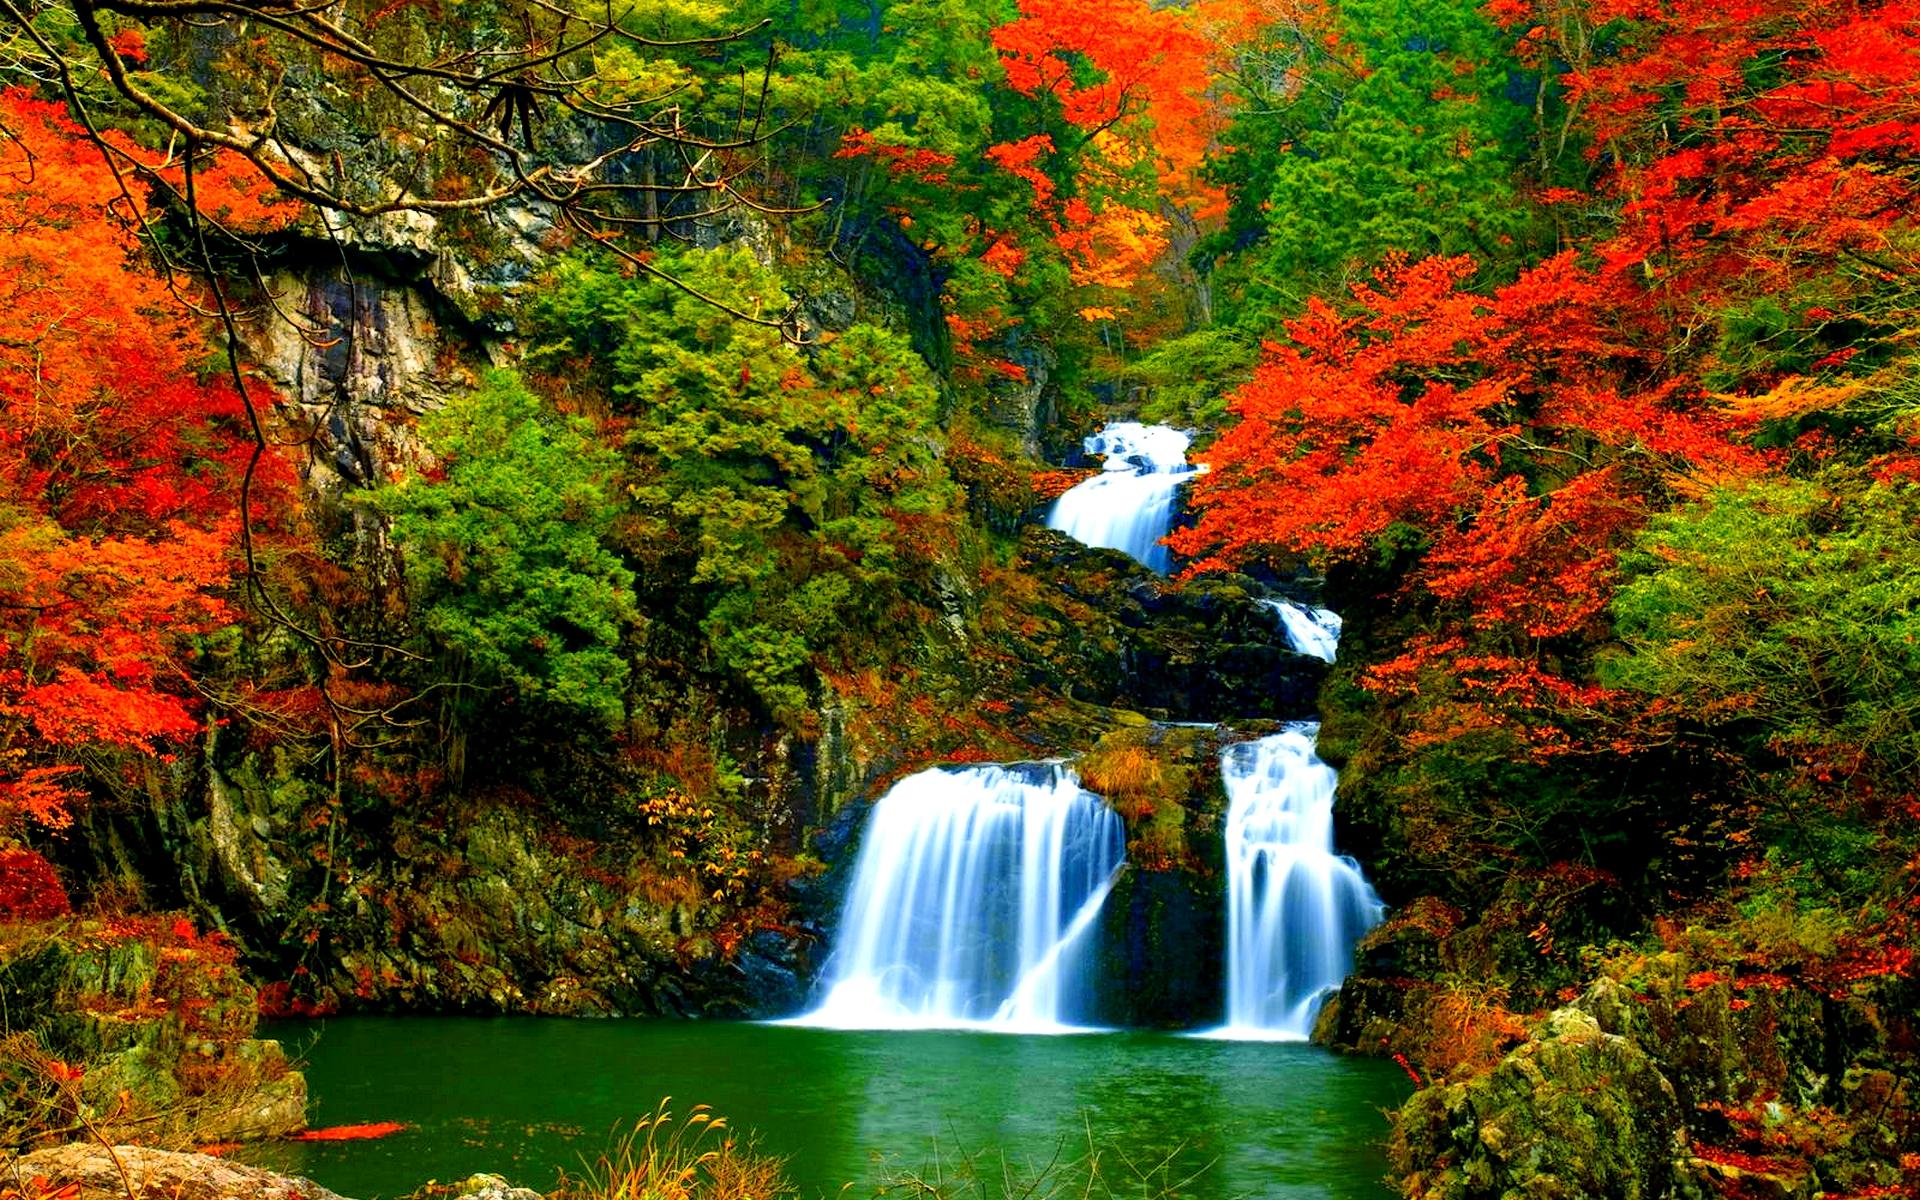 Картинка Водопад в осеннем лесу » Осень » Природа ...